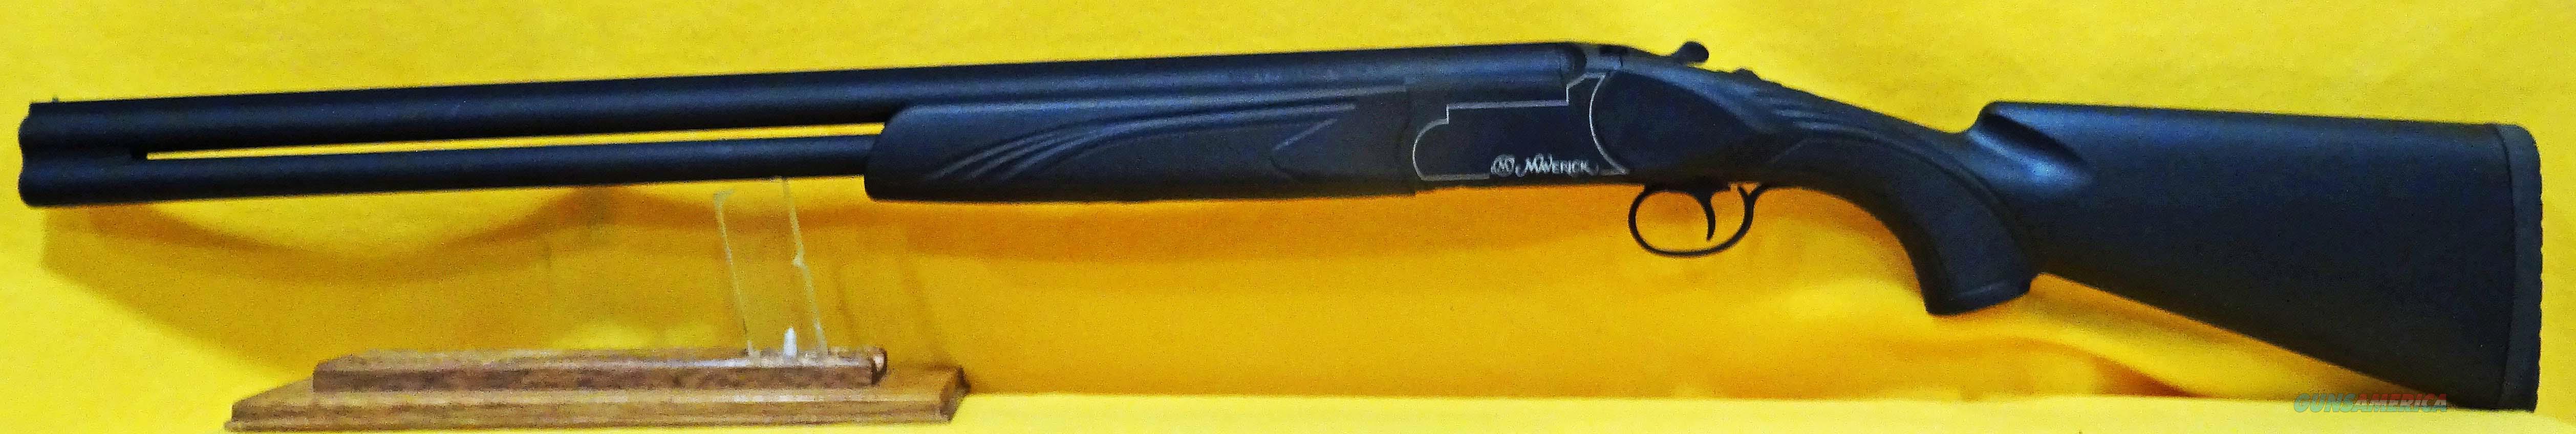 MAVERICK OVER/UNDER  Guns > Shotguns > Maverick Shotguns